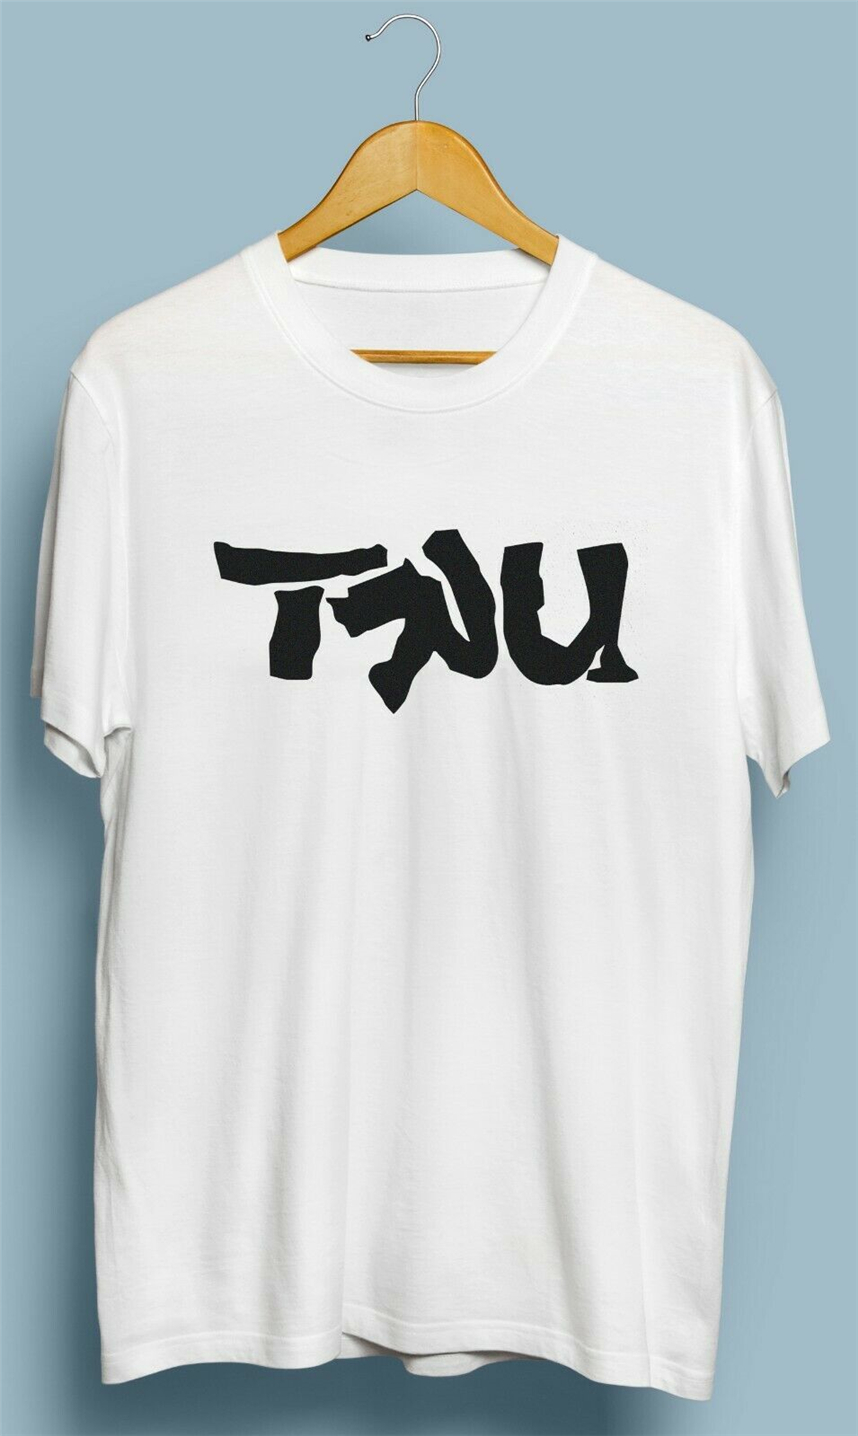 Vintage C asesinato Rap Hip Hop T camisa tamaño S M L Xl 2Xl impresa camiseta